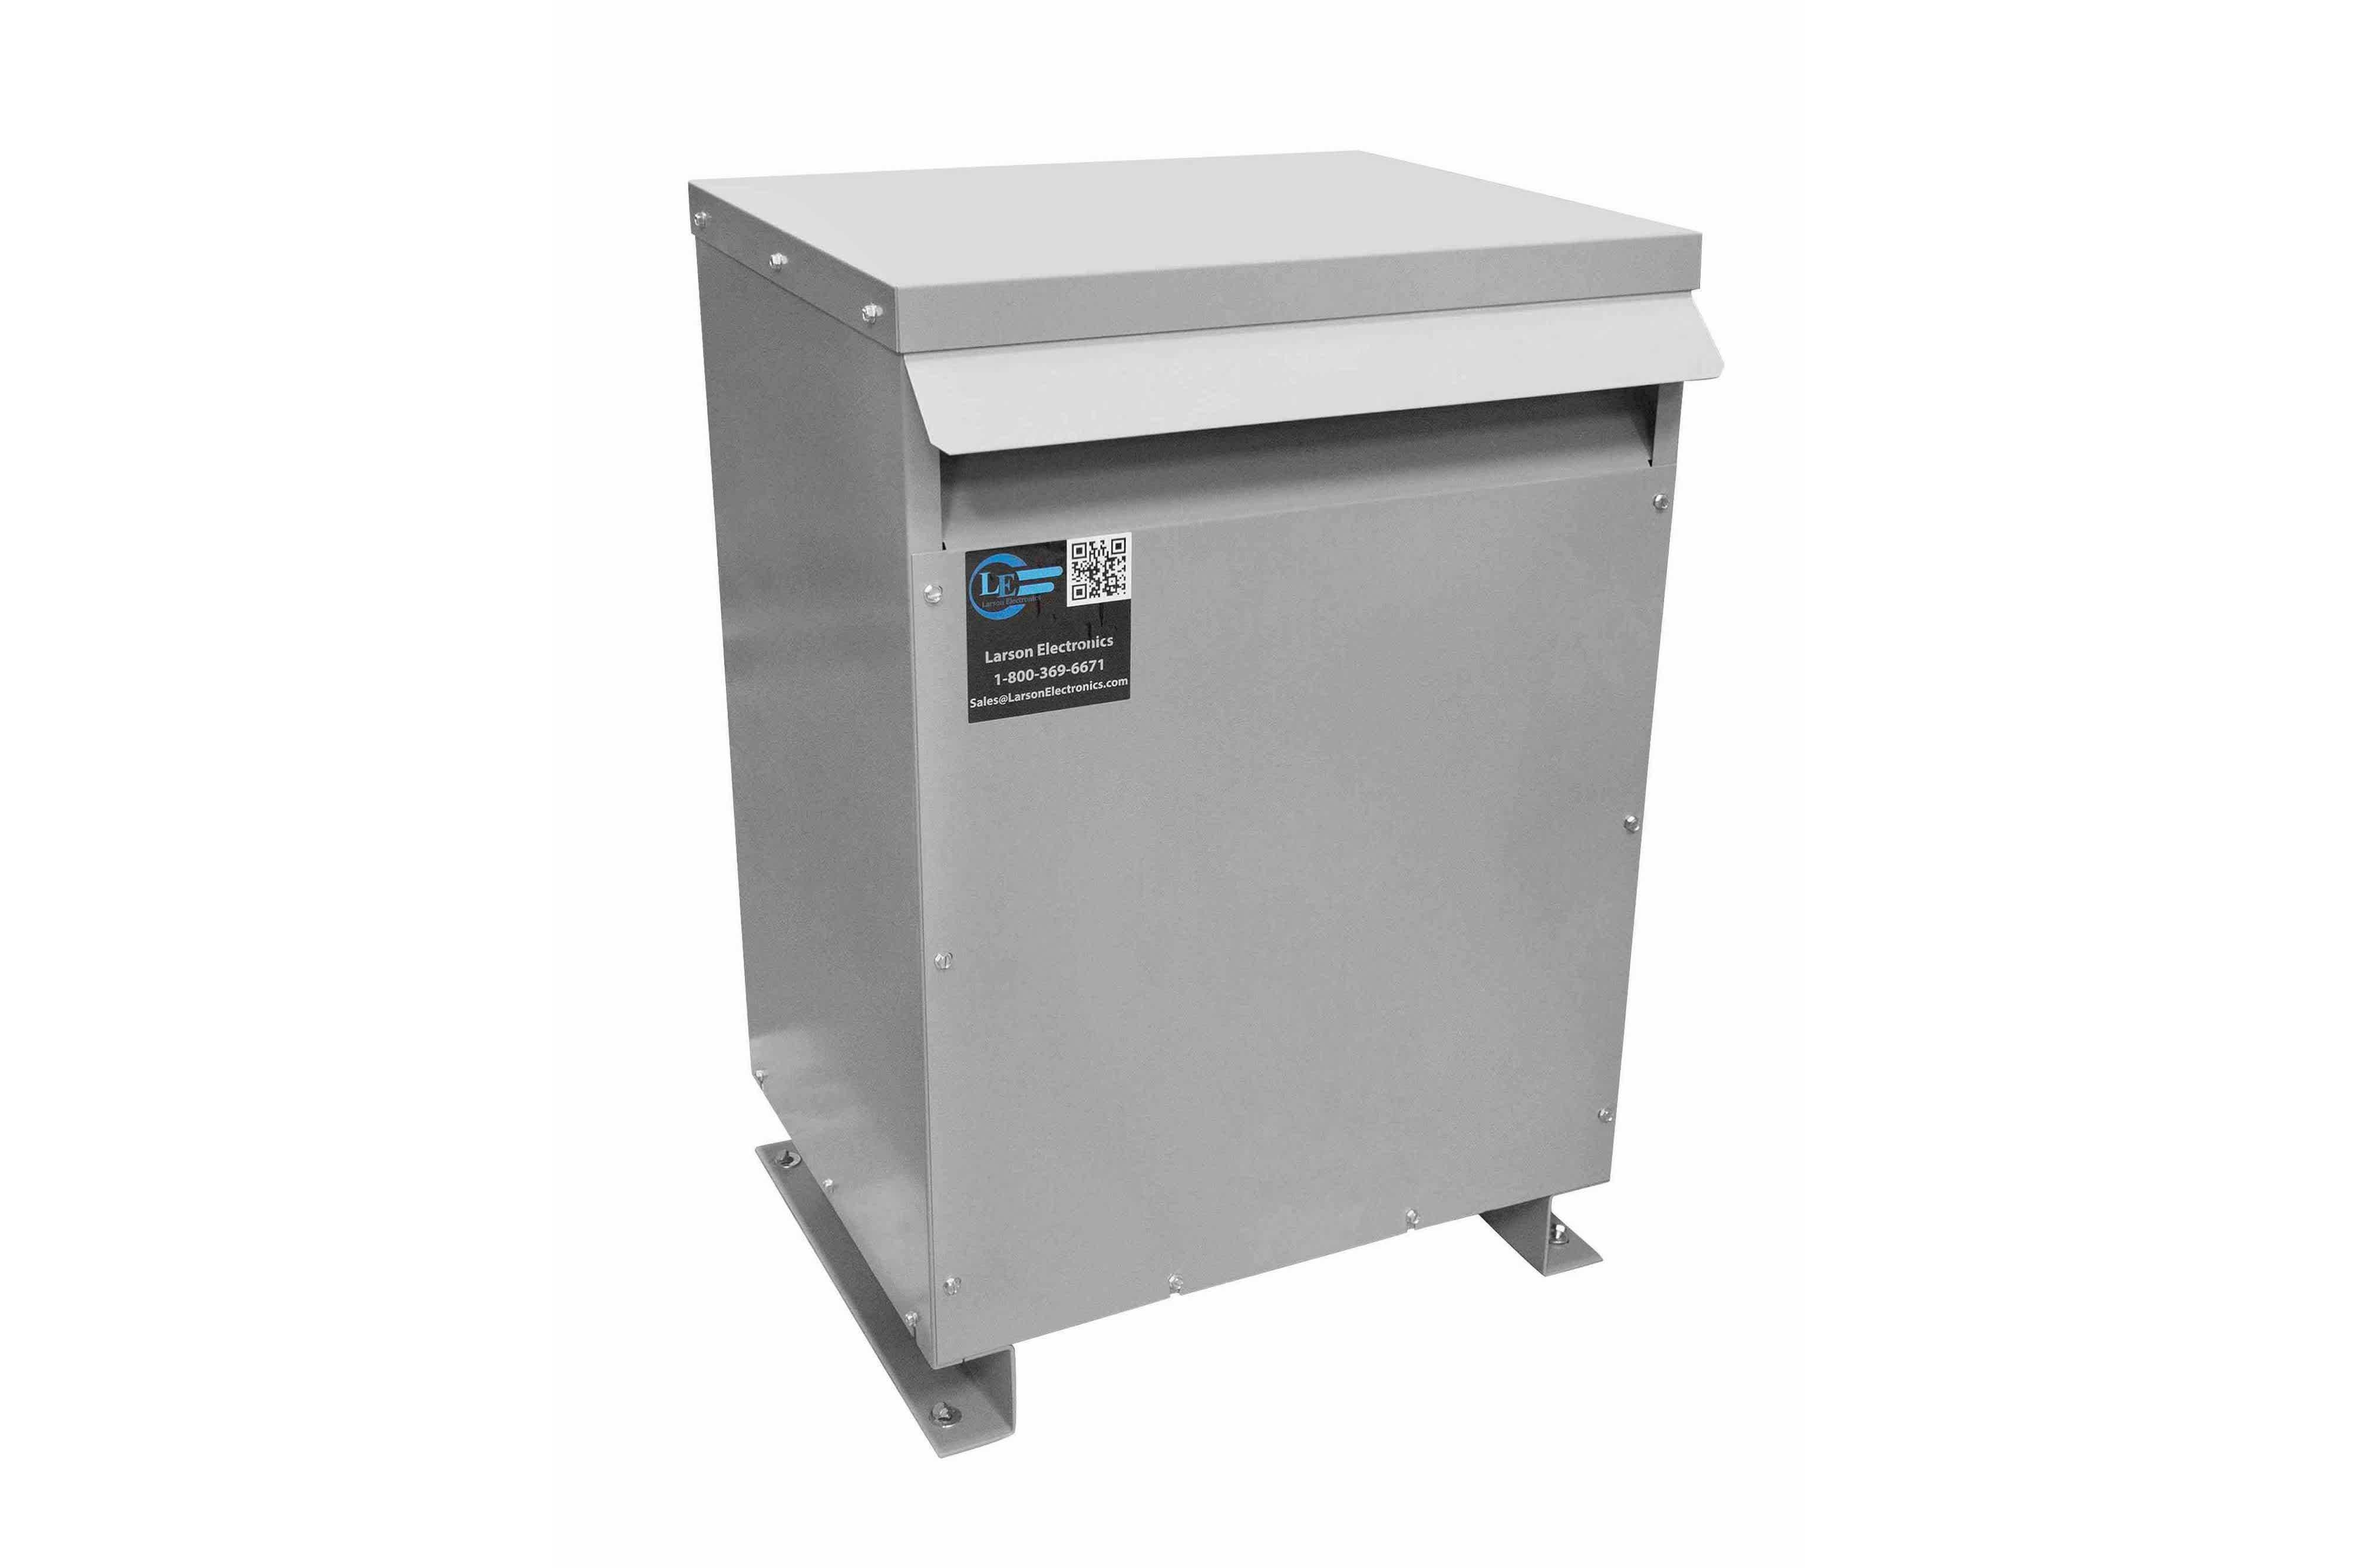 115 kVA 3PH Isolation Transformer, 575V Wye Primary, 400V Delta Secondary, N3R, Ventilated, 60 Hz